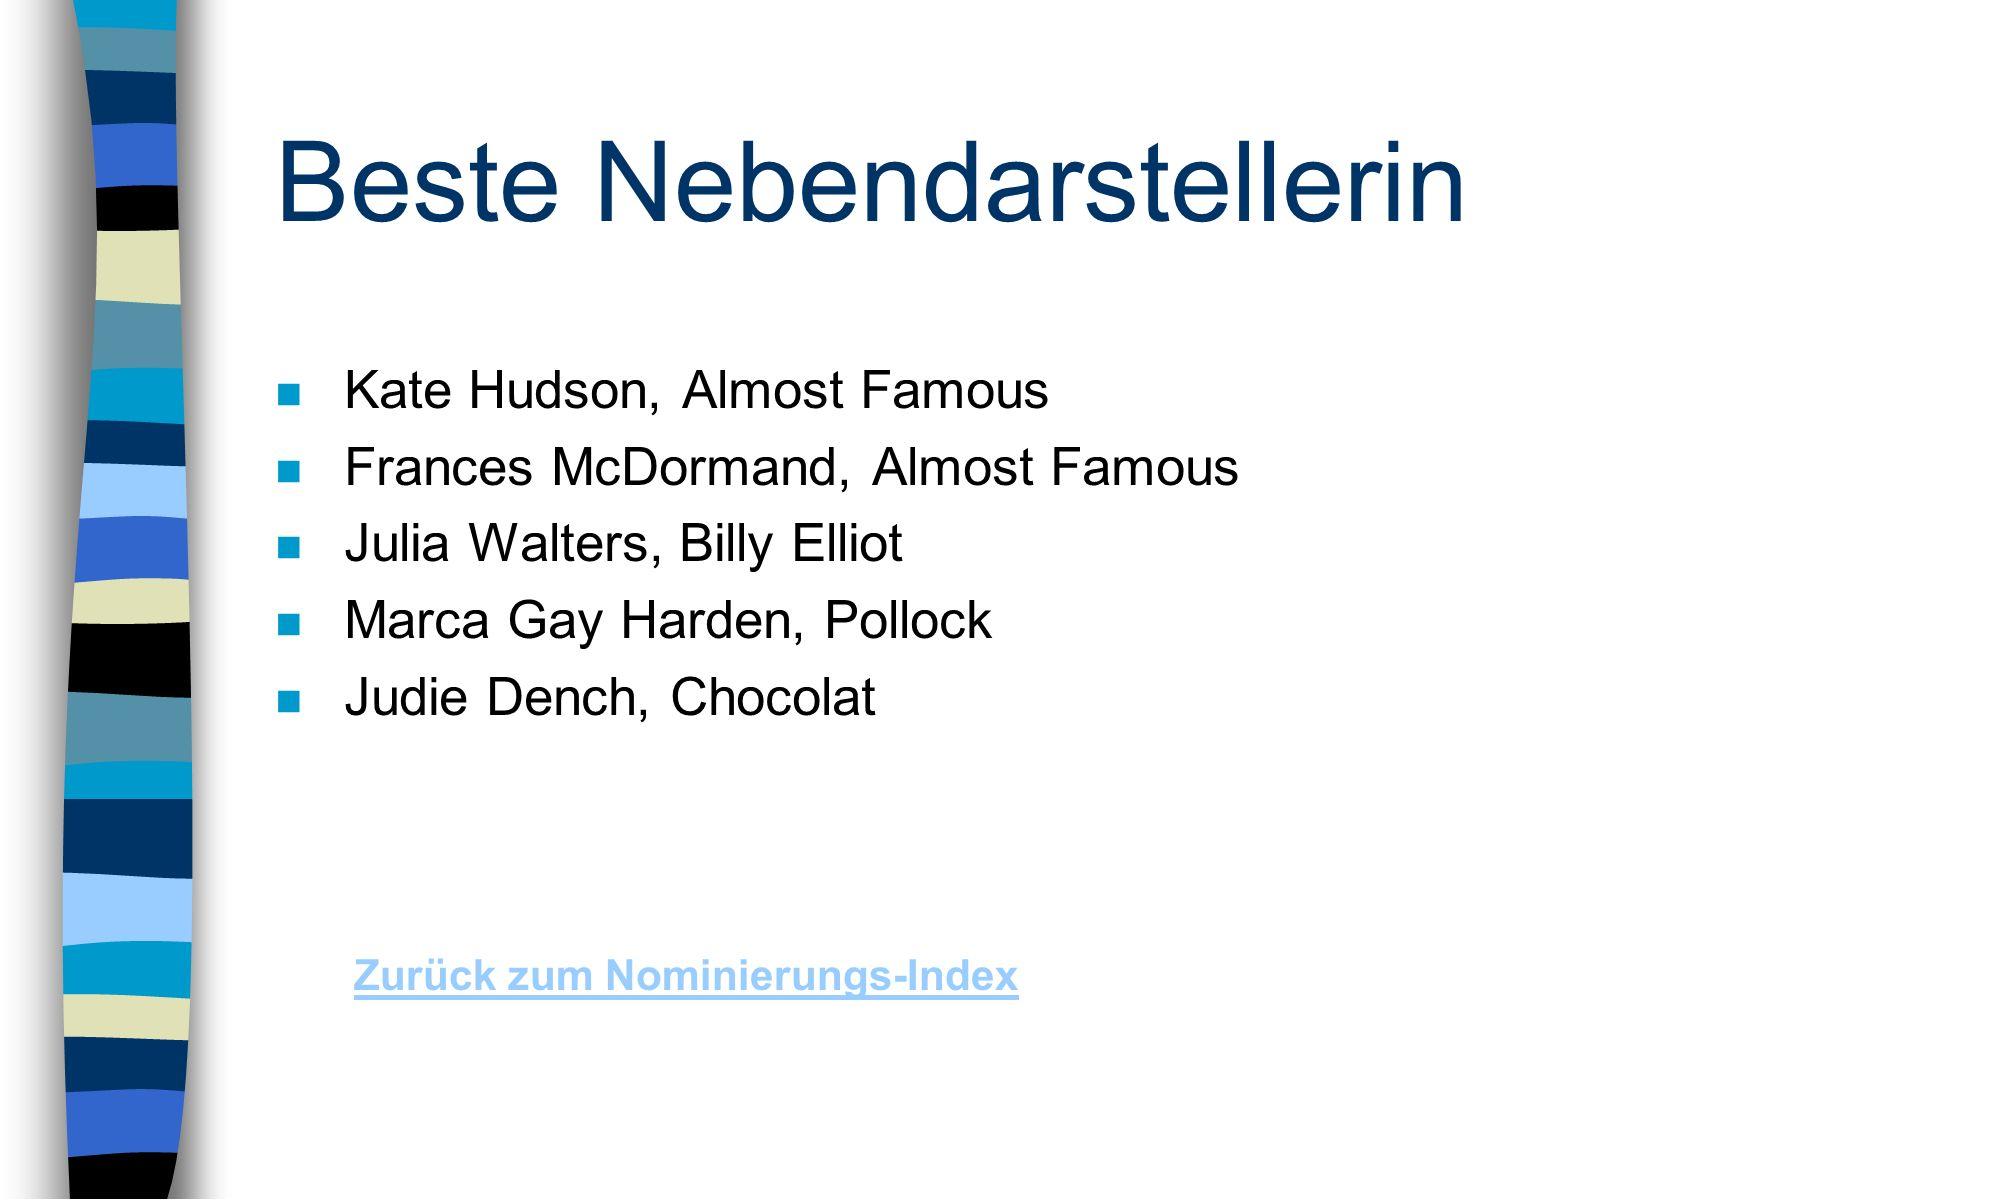 Beste Nebendarstellerin n Kate Hudson, Almost Famous n Frances McDormand, Almost Famous n Julia Walters, Billy Elliot n Marca Gay Harden, Pollock n Judie Dench, Chocolat Zurück zum Nominierungs-Index